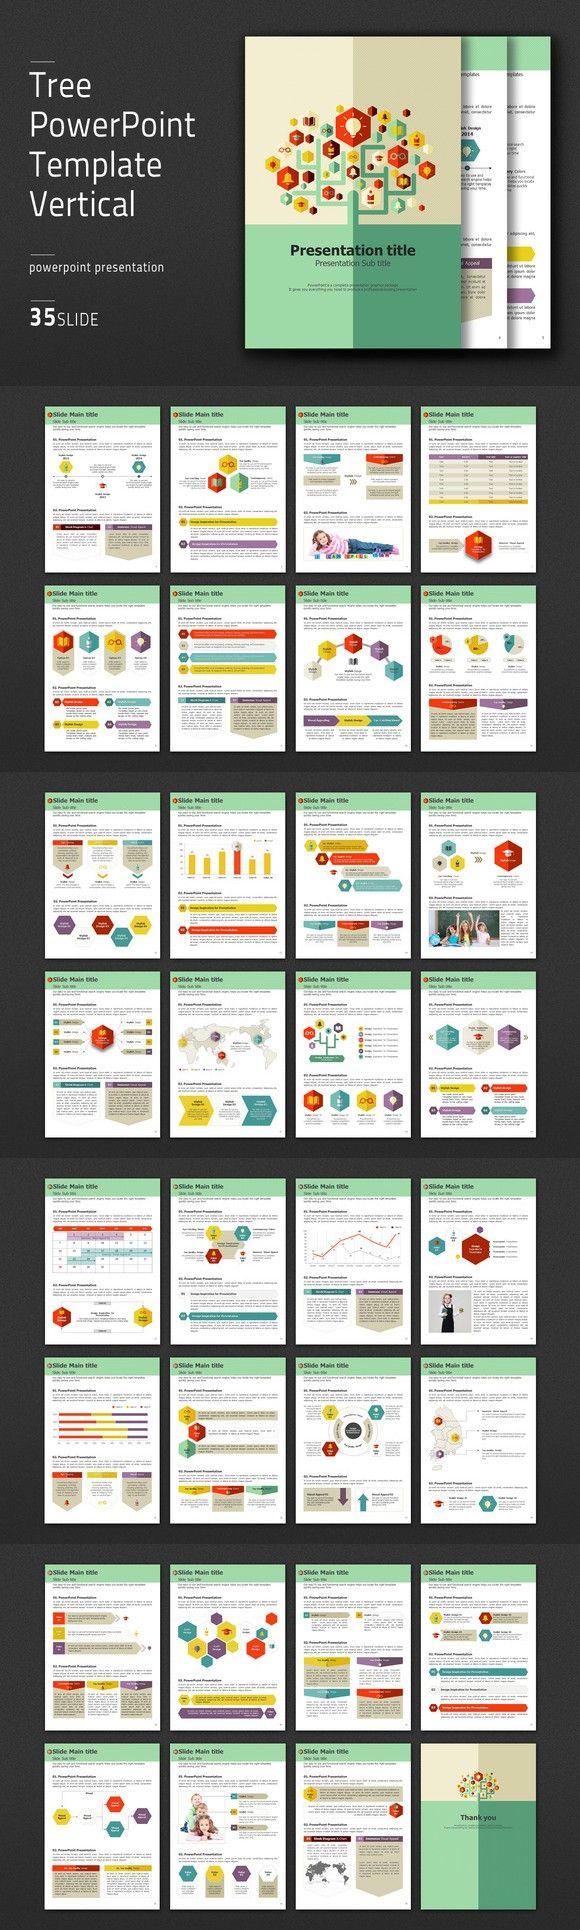 29 best presentation powerpoint images on pinterest board tree powerpoint template vertical powerpoint templates 4100 toneelgroepblik Image collections